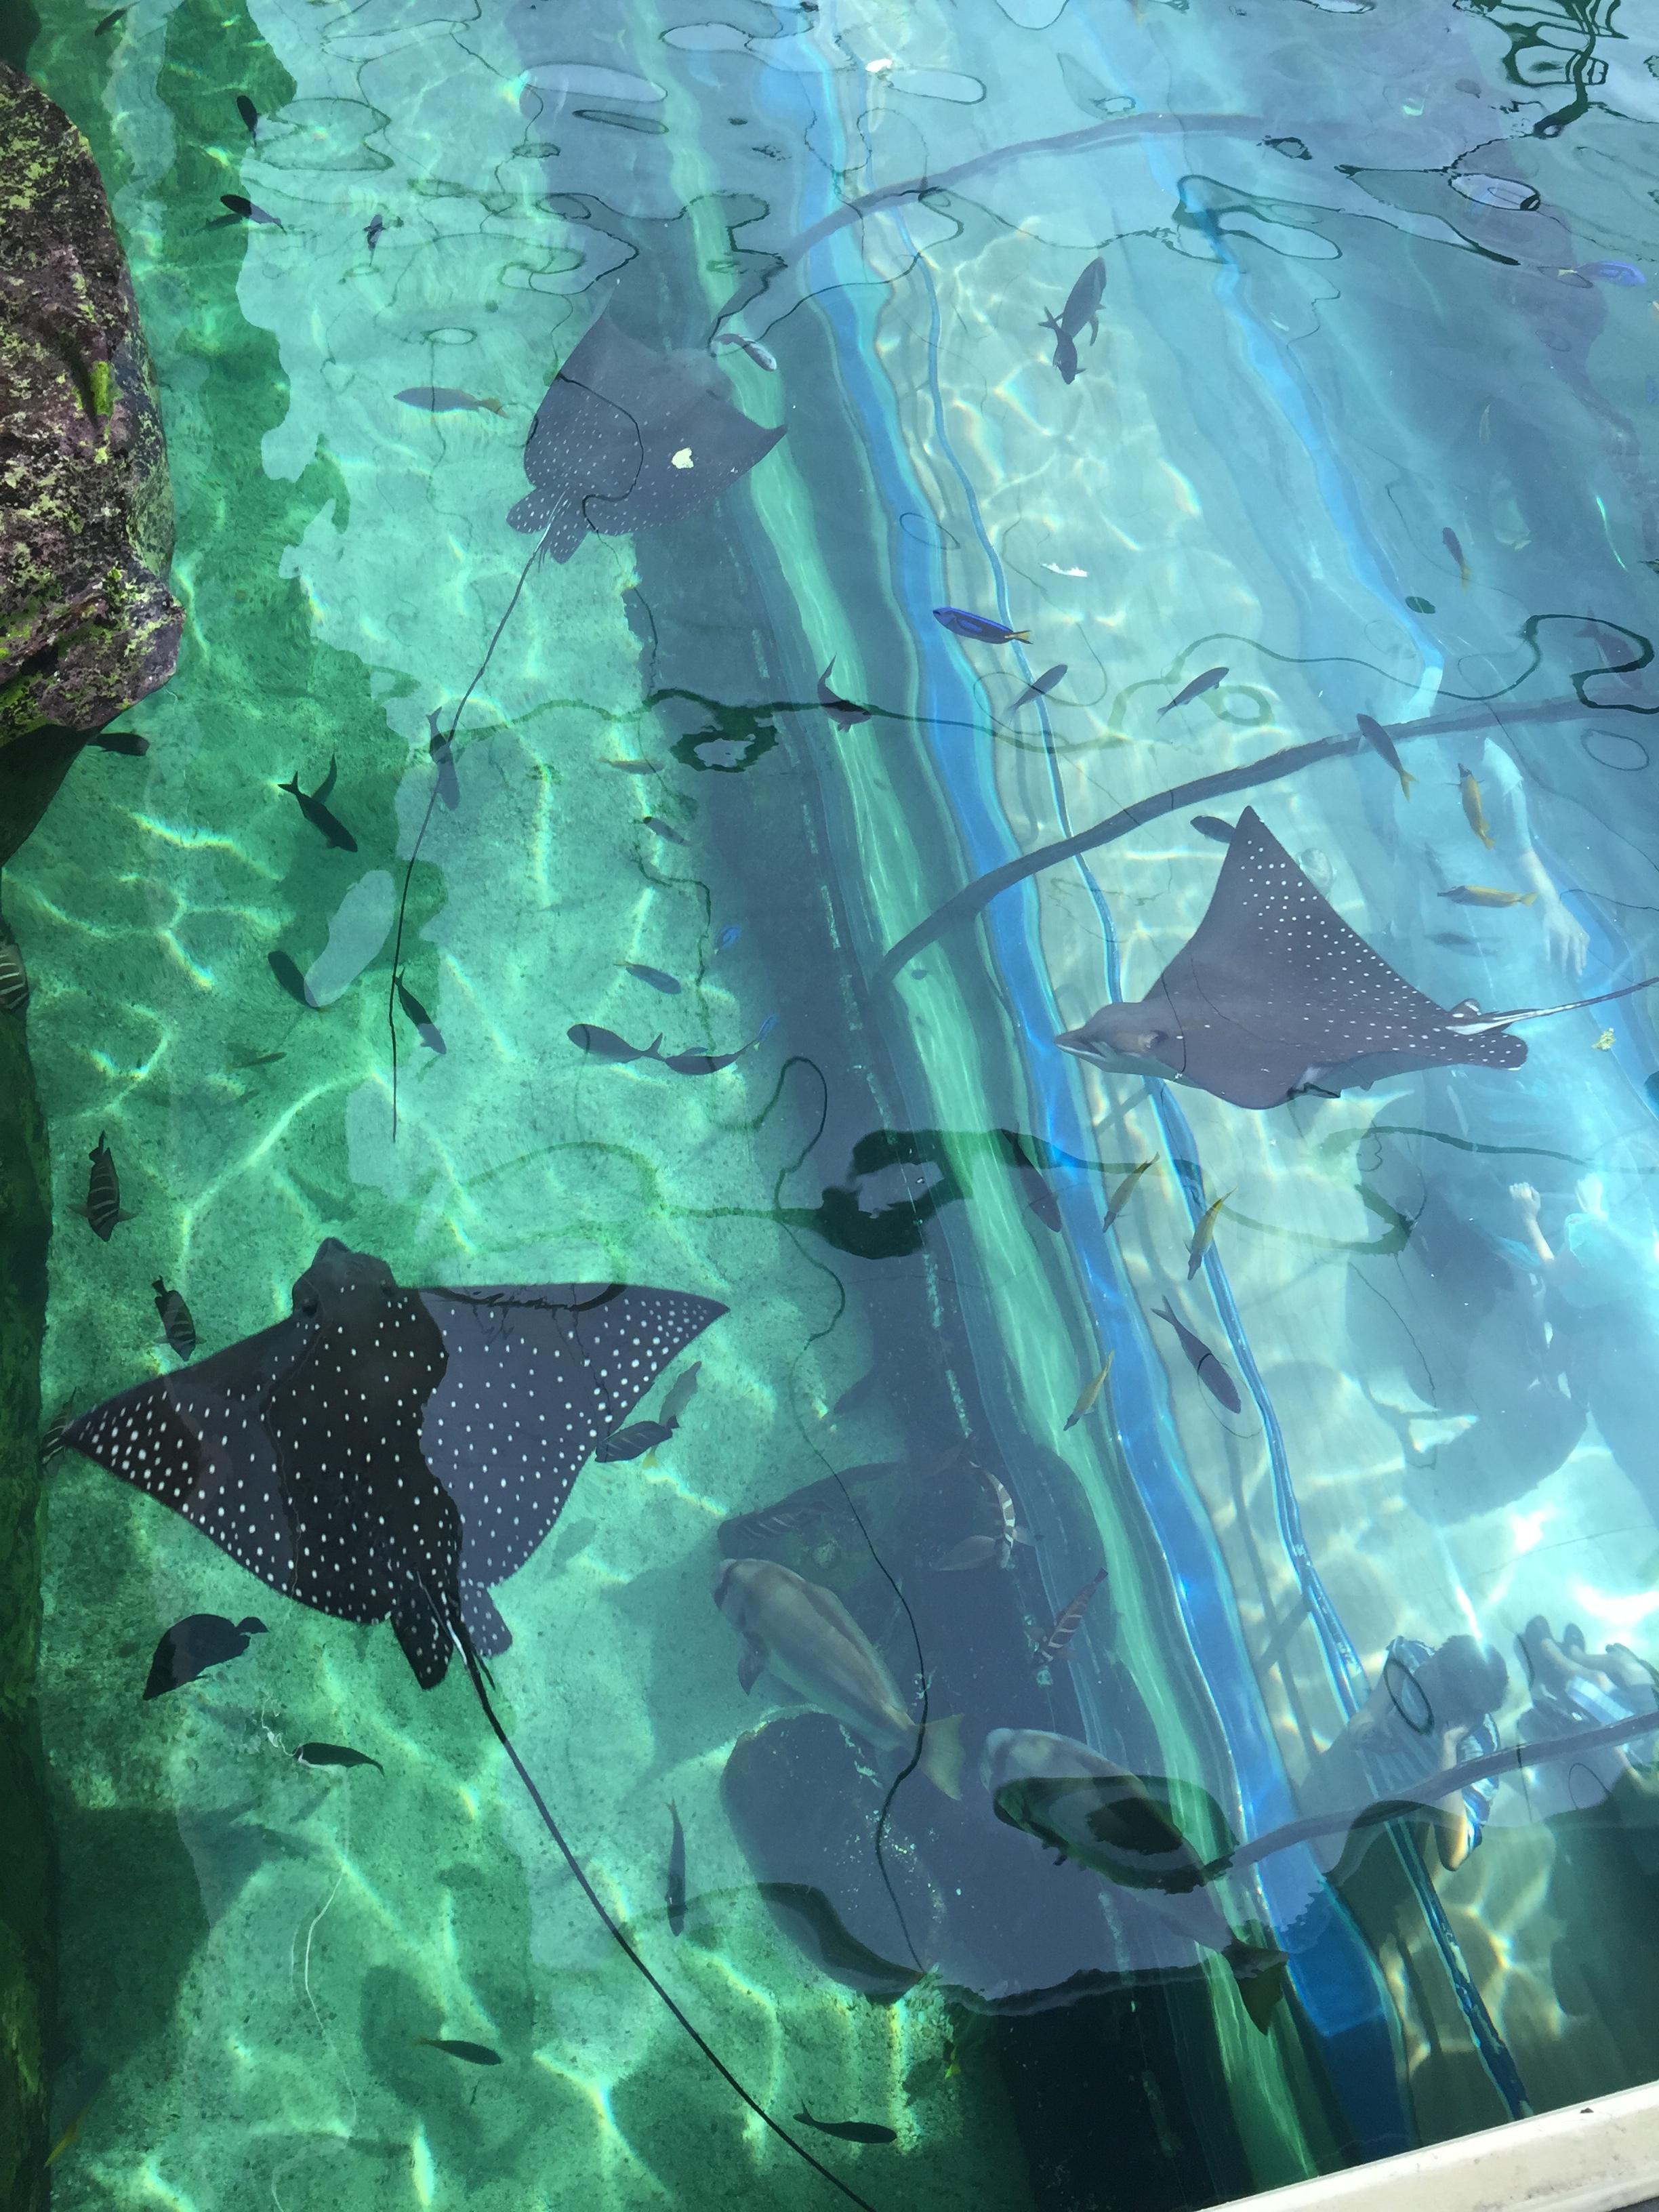 Sea Life Sydney Aquarium - Rays